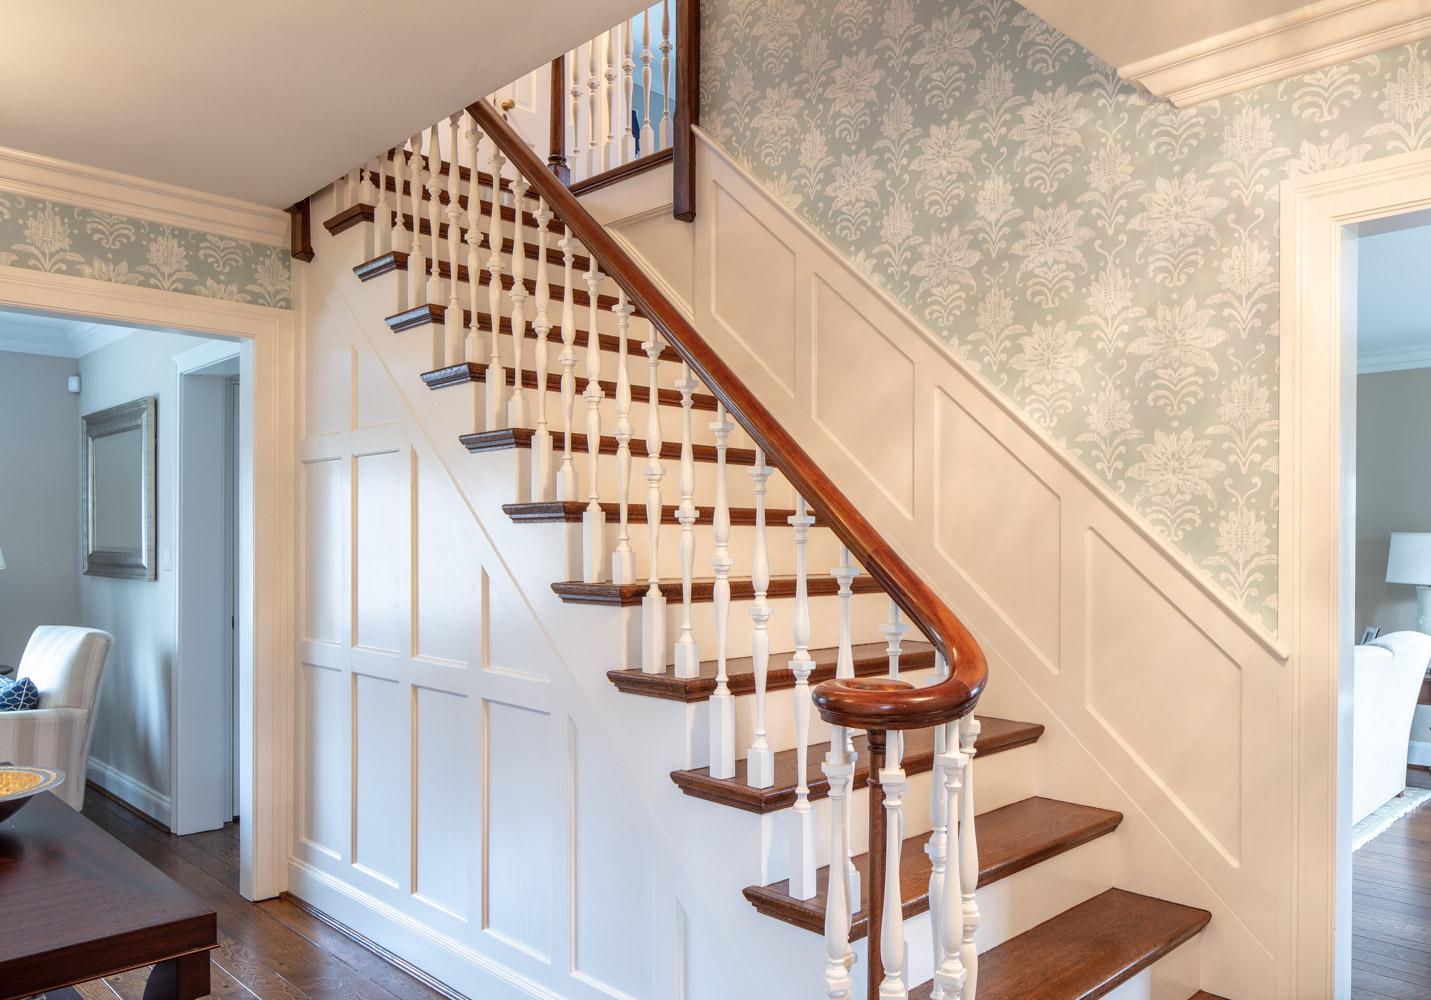 Modern house with interior wooden stairway